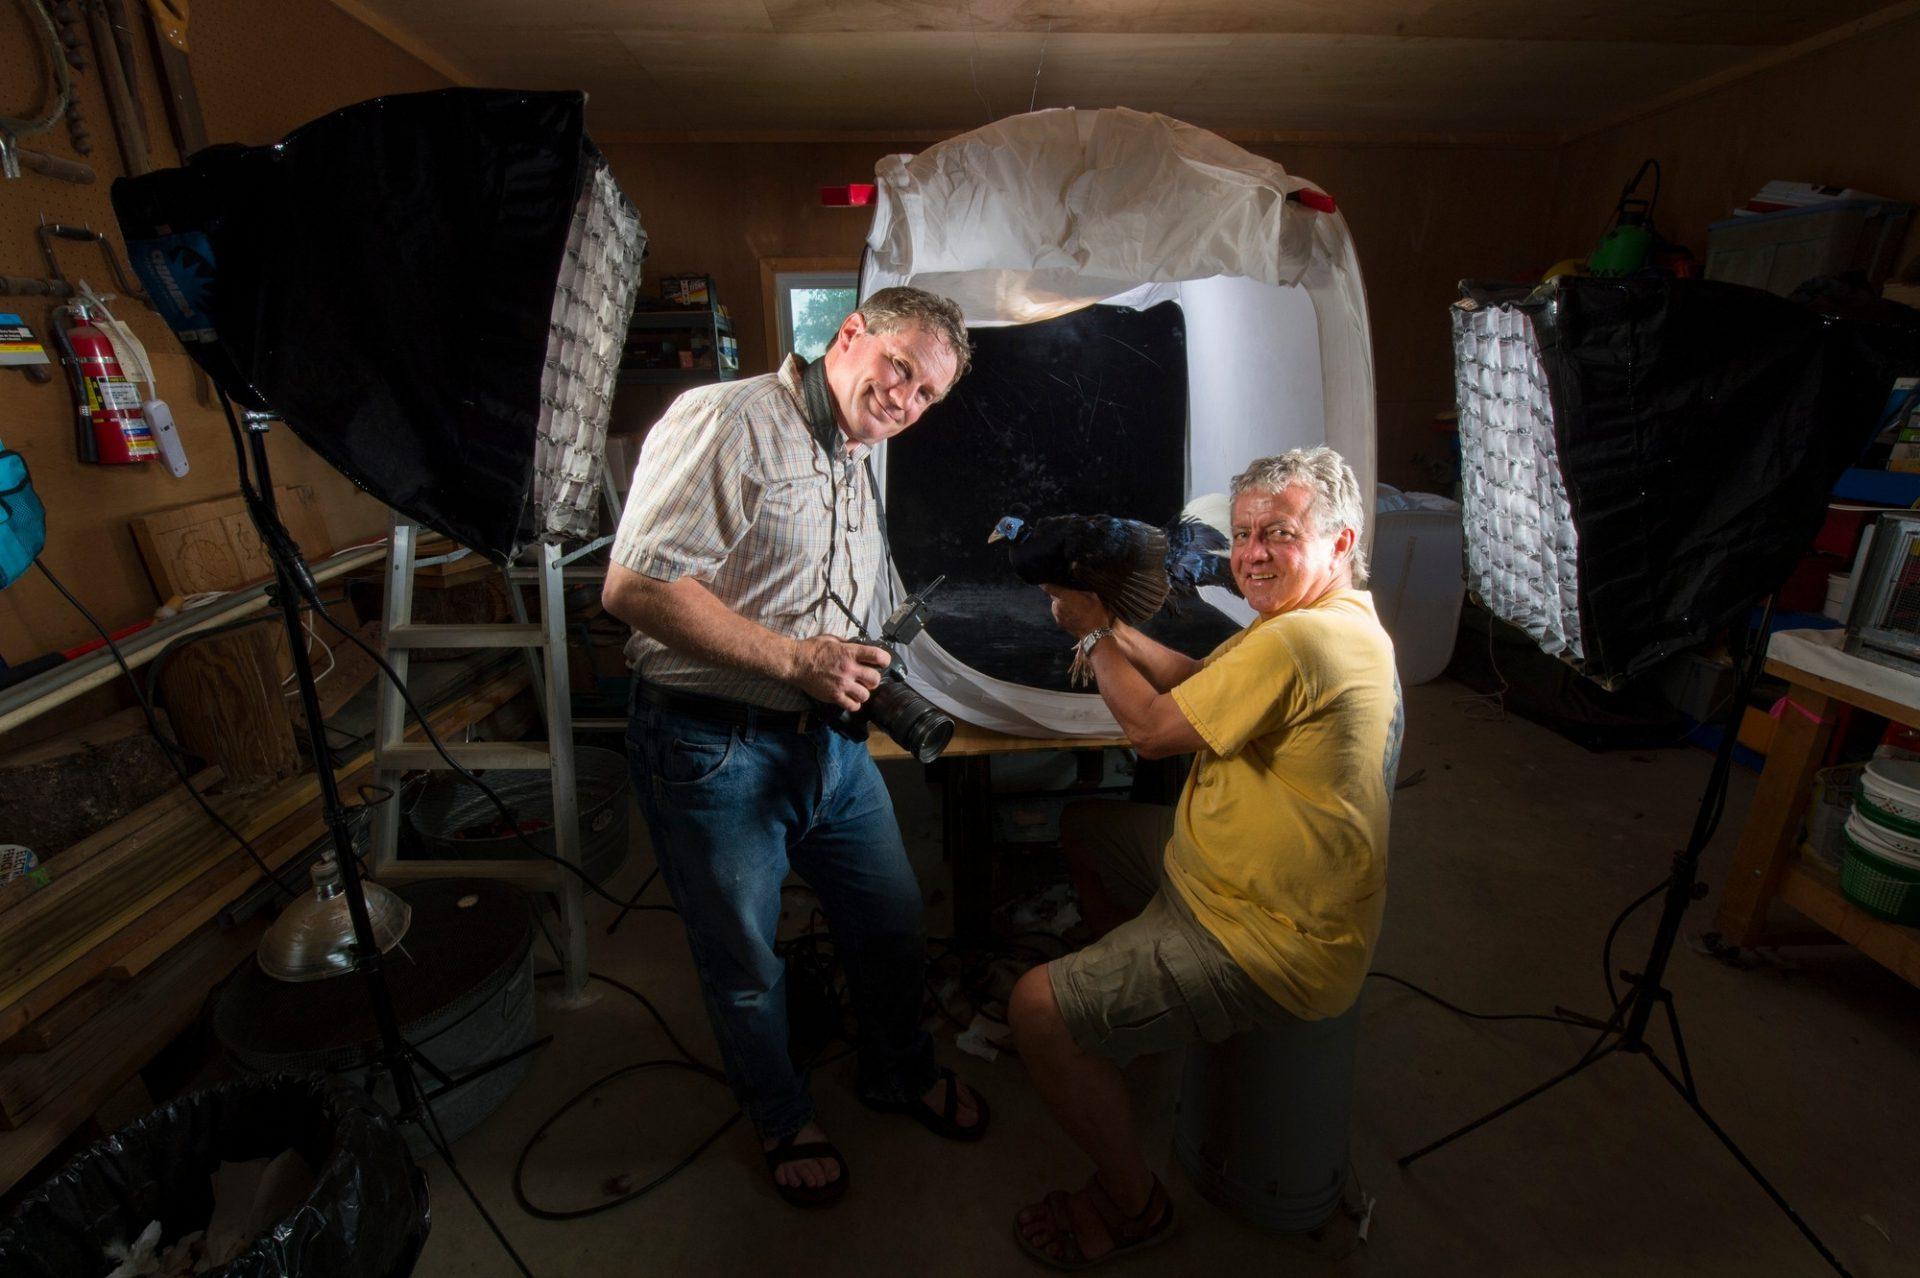 Photo: Behind the scenes during a photo shoot at Pheasant Heaven, a private pheasant breeding center near Clinton, NC.